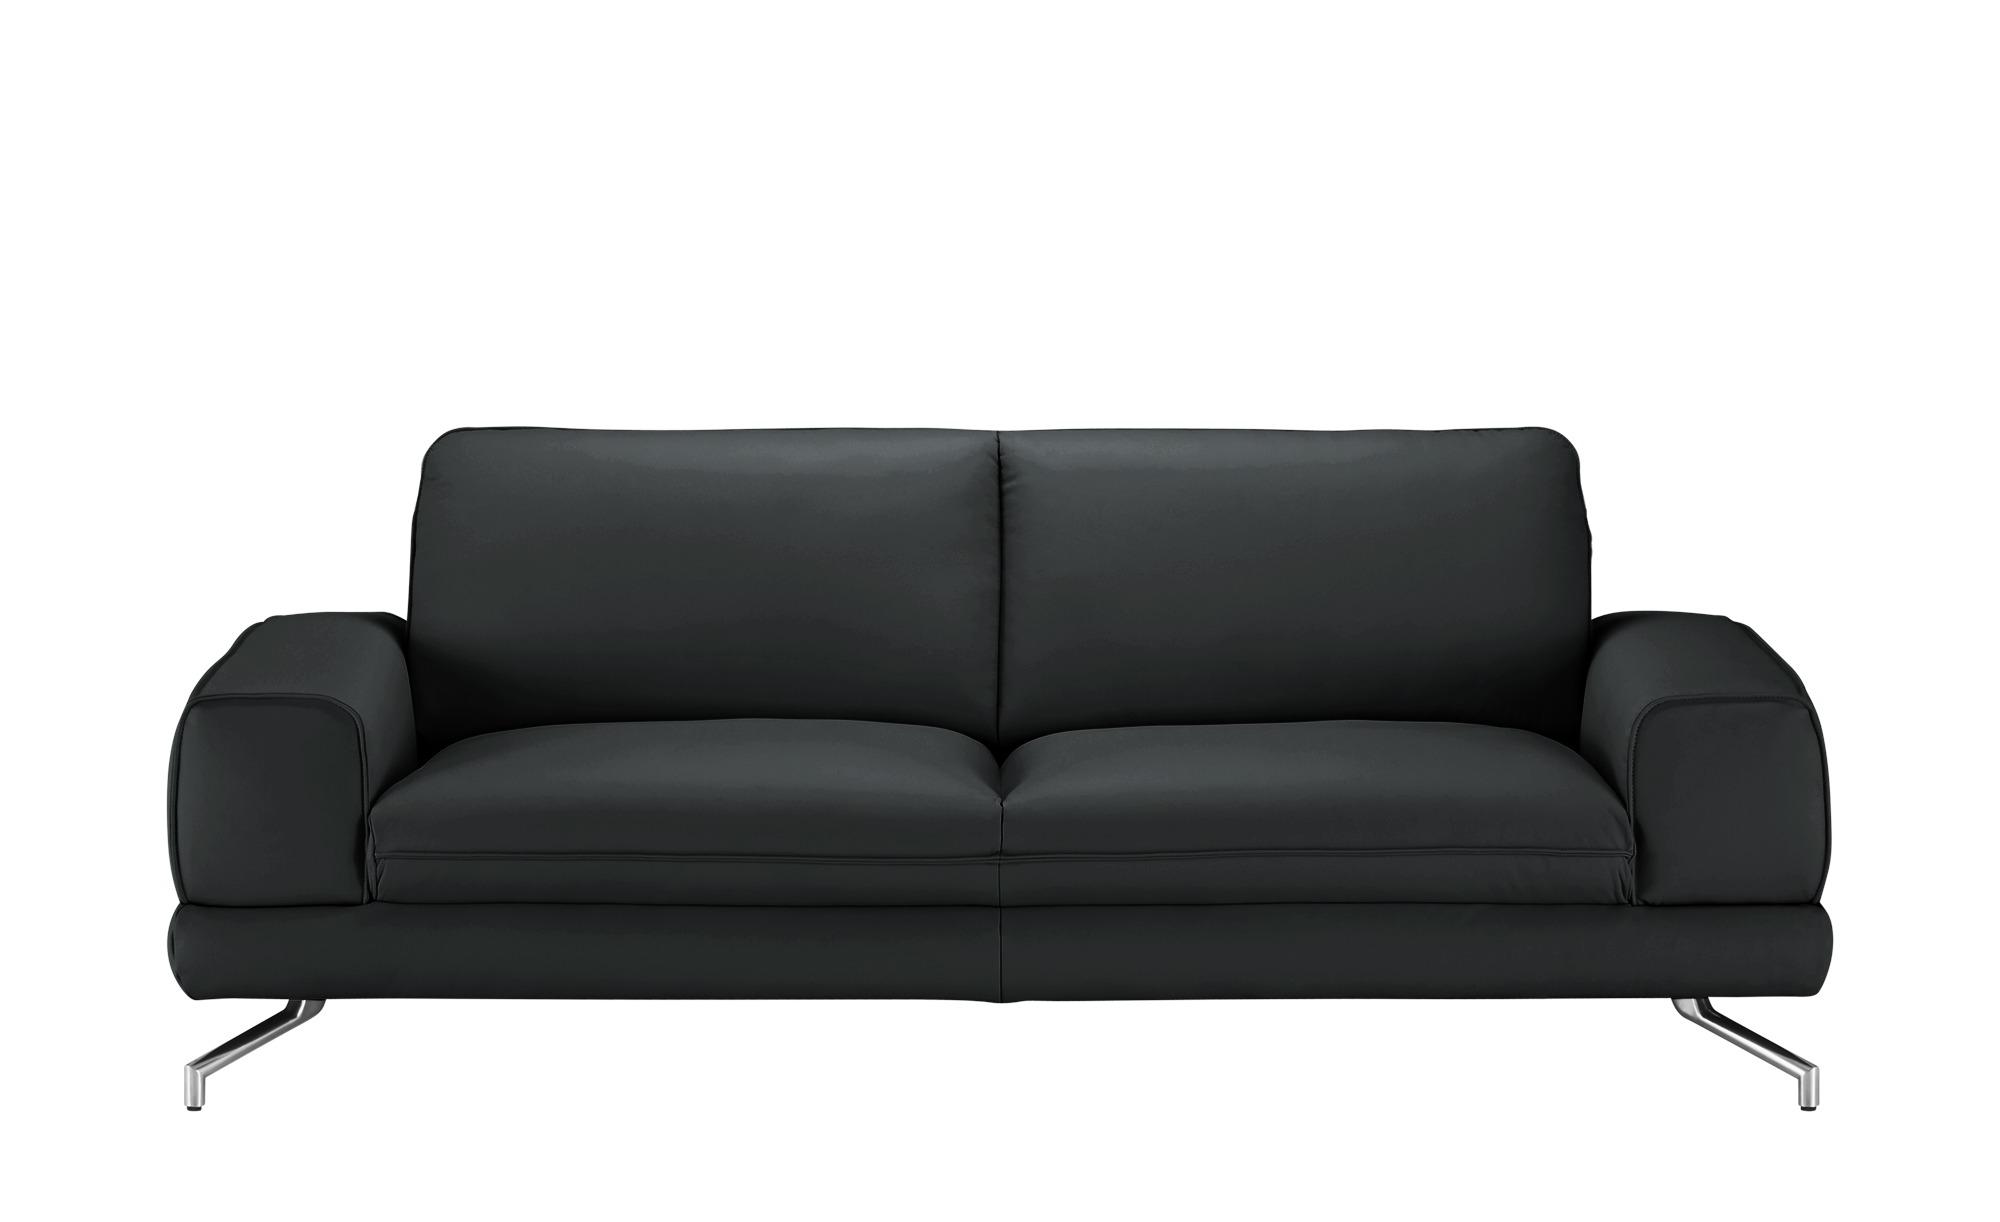 smart Sofa  Bonika ¦ schwarz ¦ Maße (cm): B: 218 H: 83 T: 95 Polstermöbel > Sofas > 3-Sitzer - Höffner